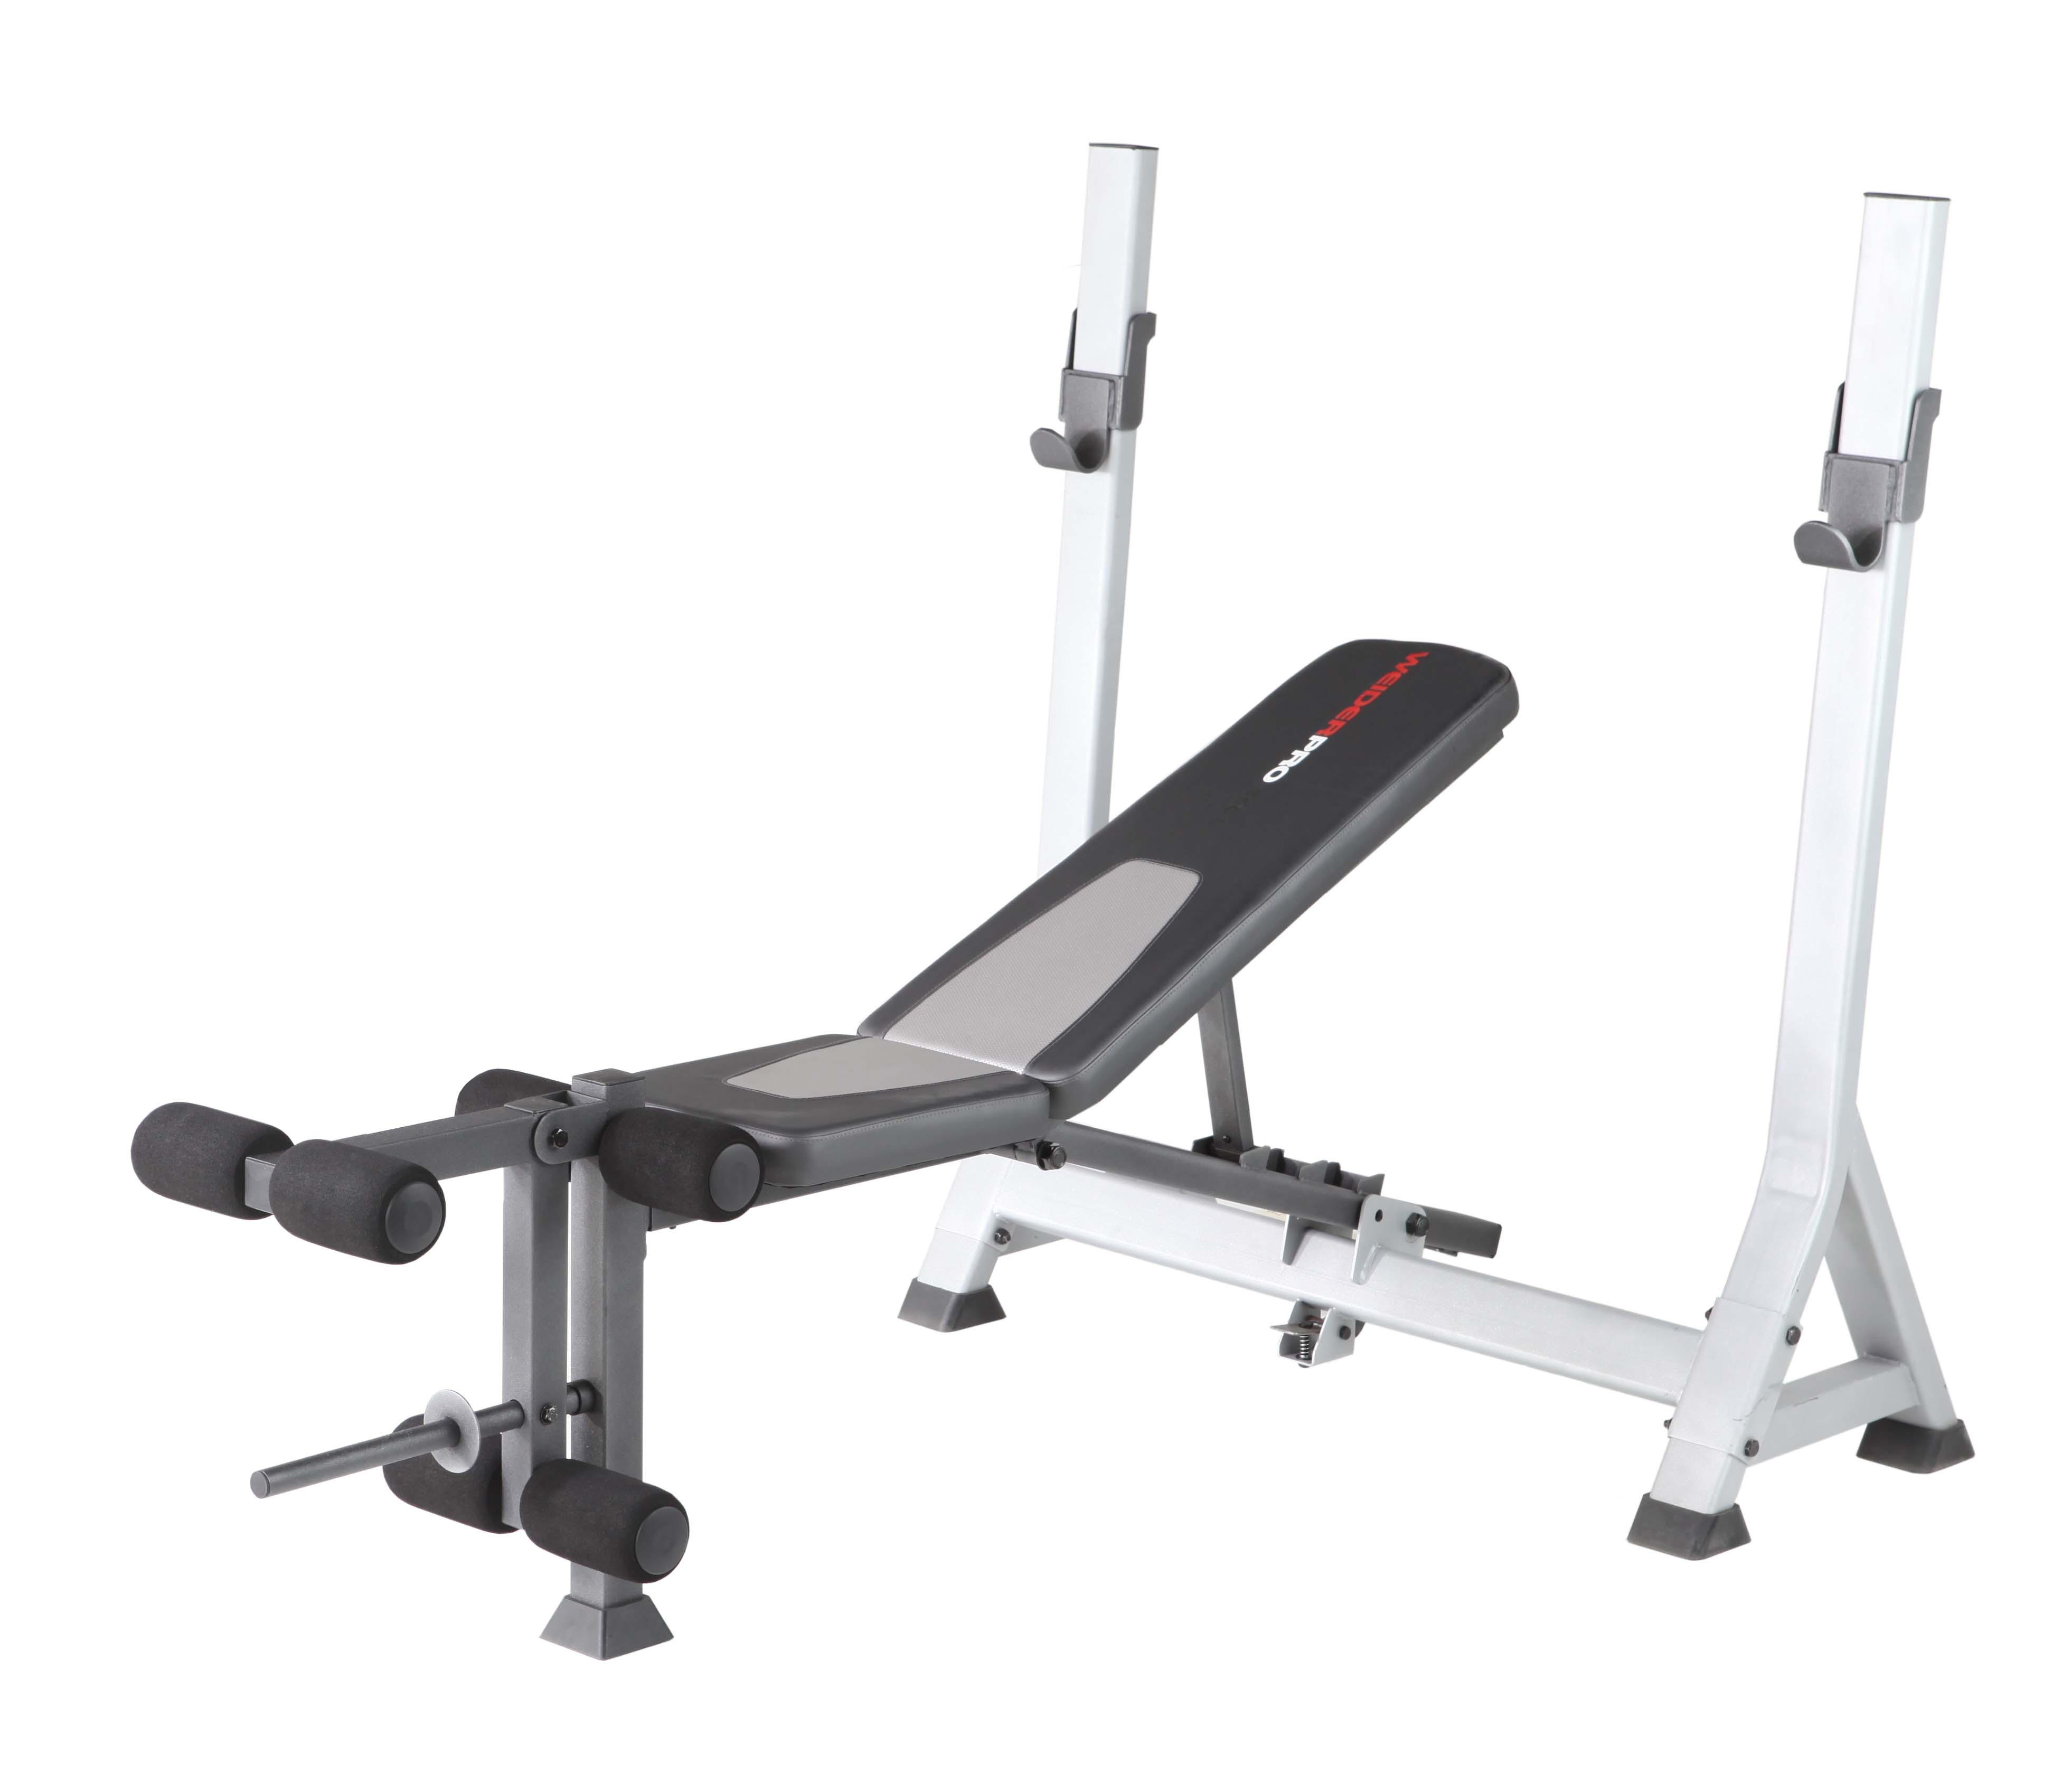 Weider Pro 340 Lc Folding Weight Bench